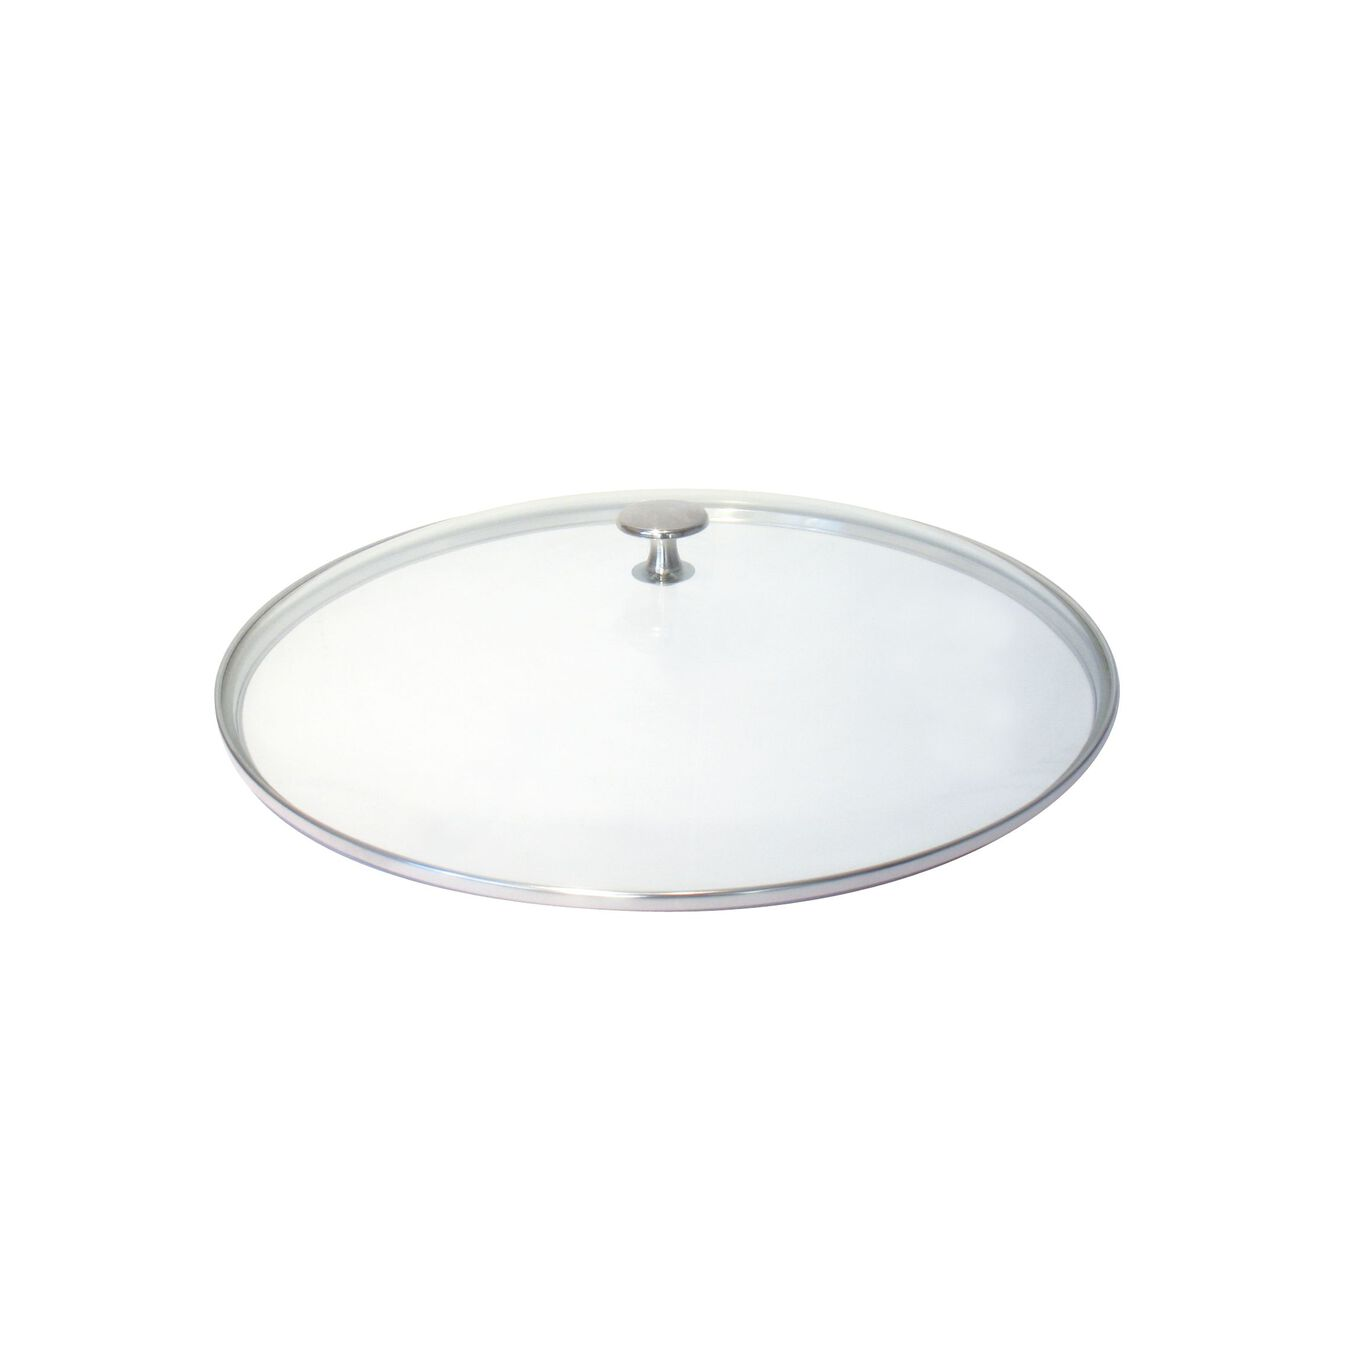 Deckel, 16 cm | rund | Glas | Transparent,,large 1